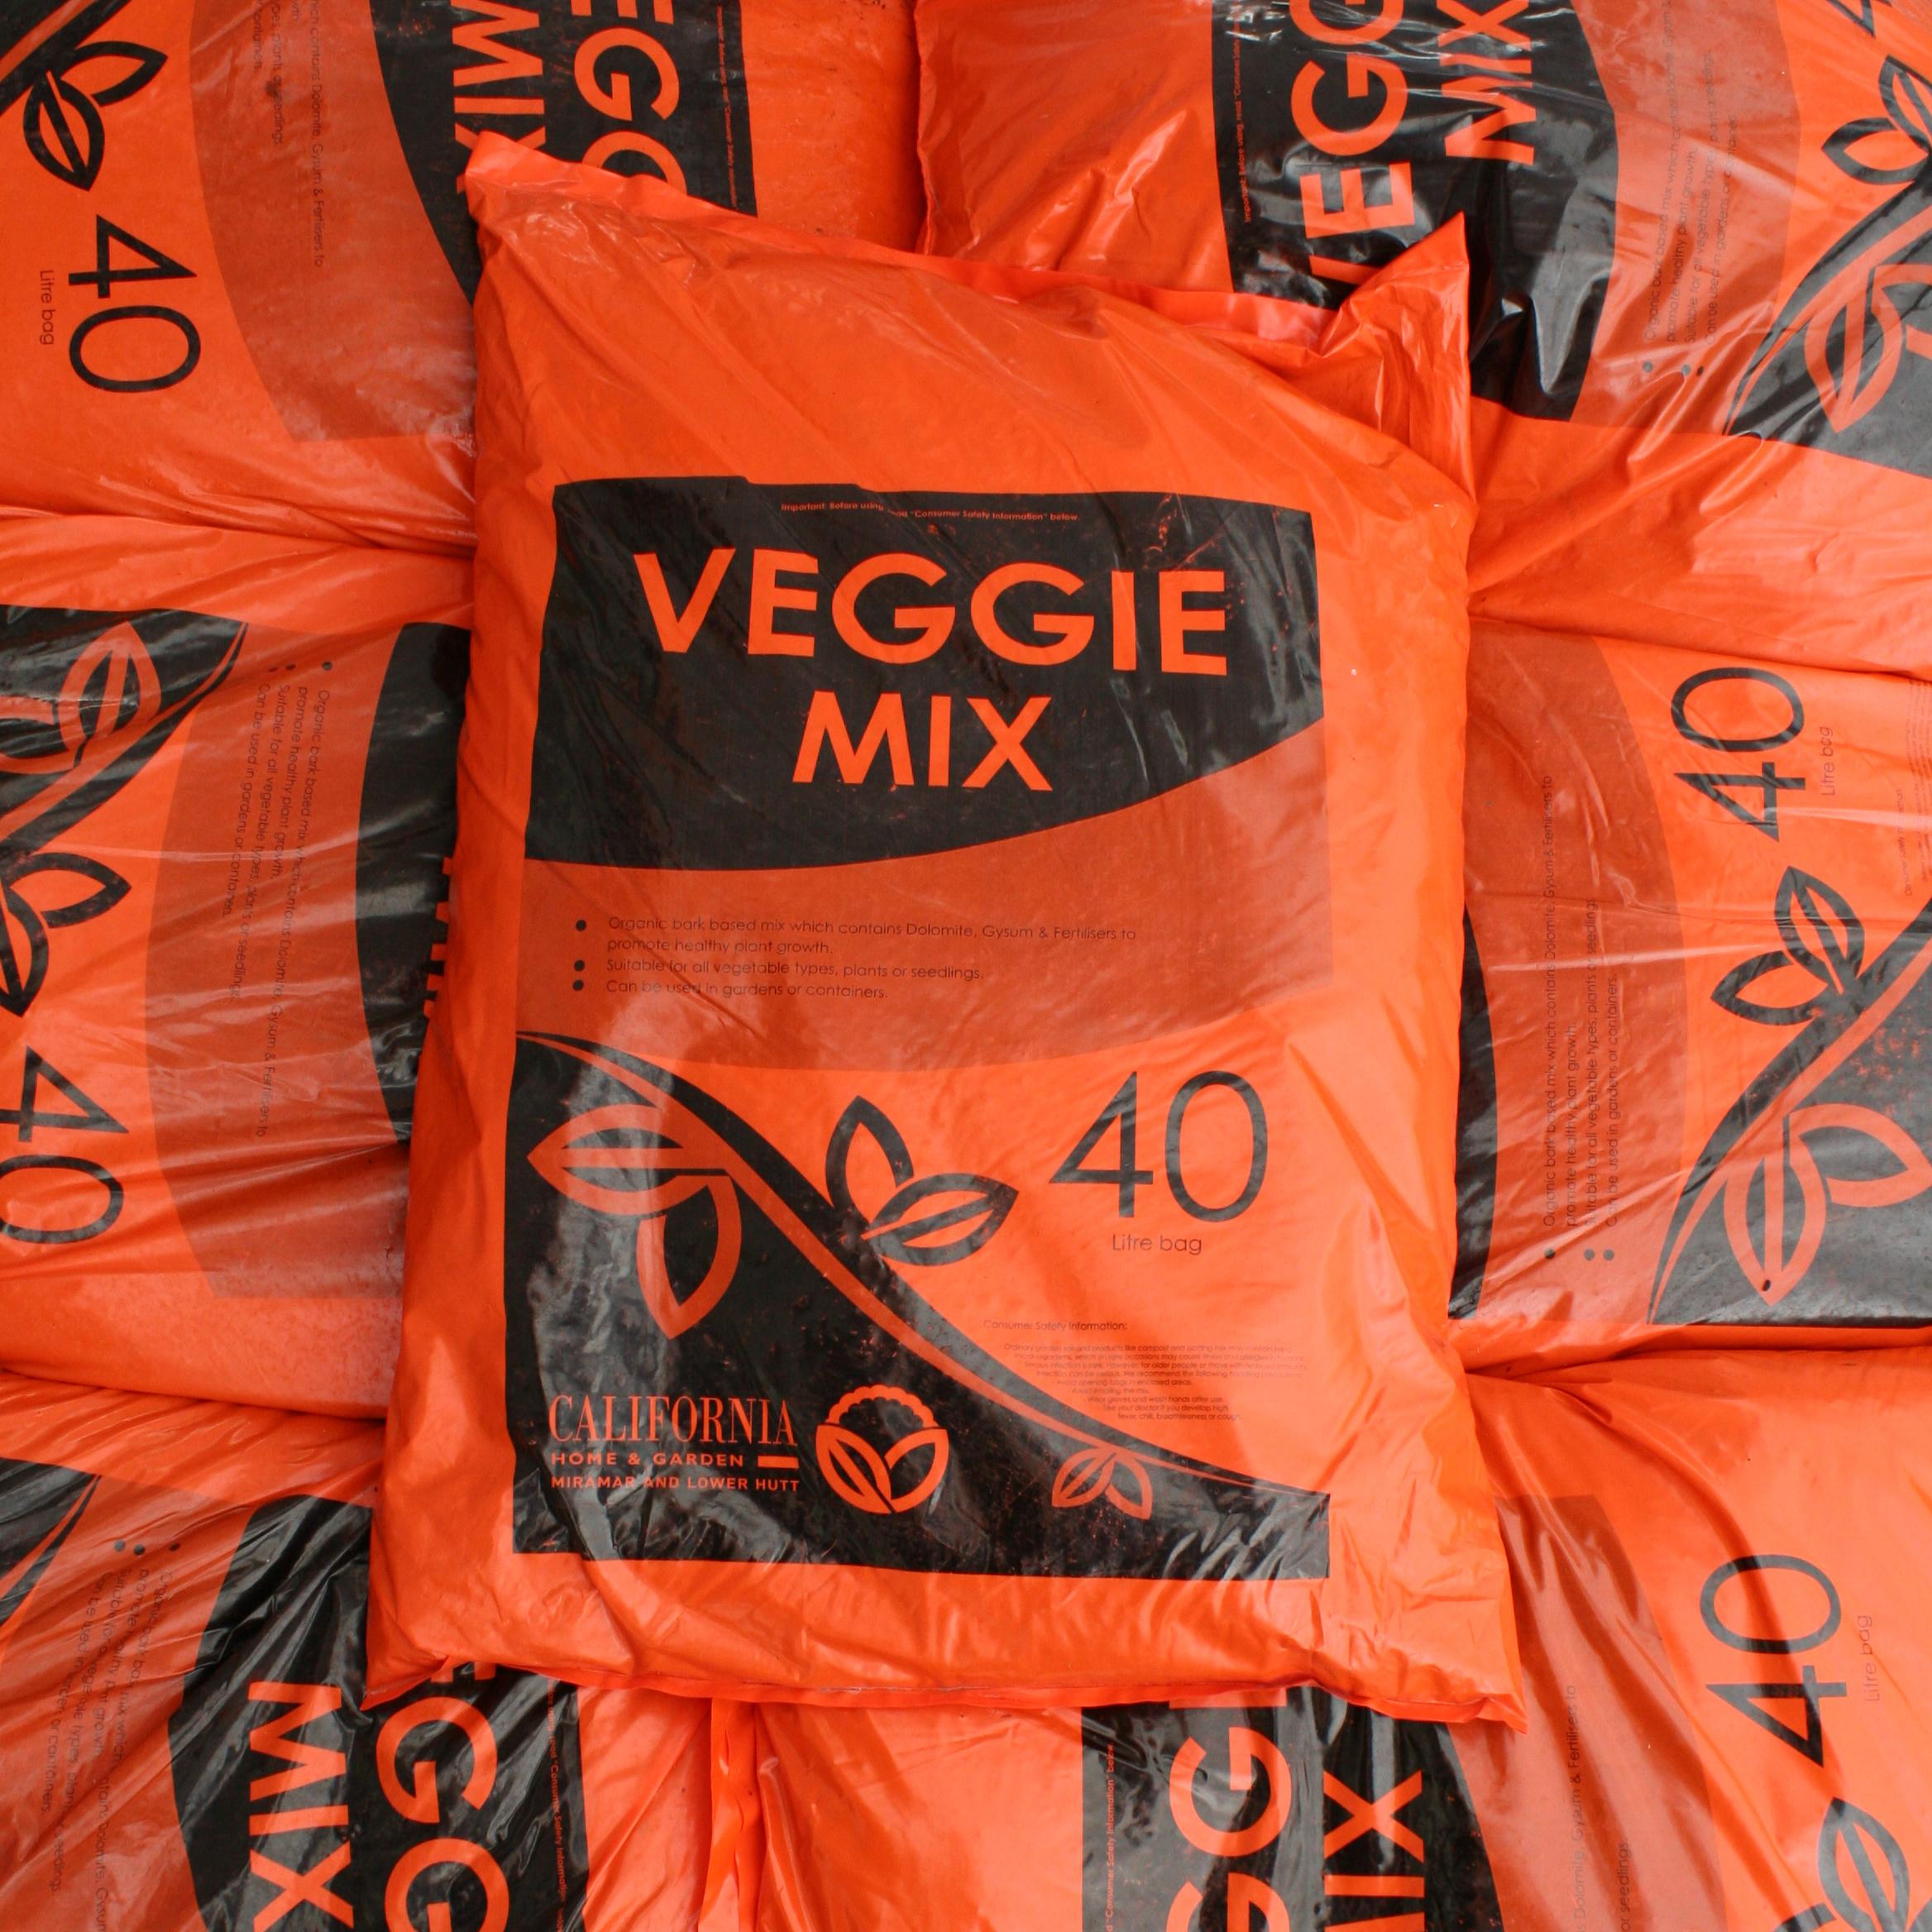 California Veggie Mix 40L2 for $26 -